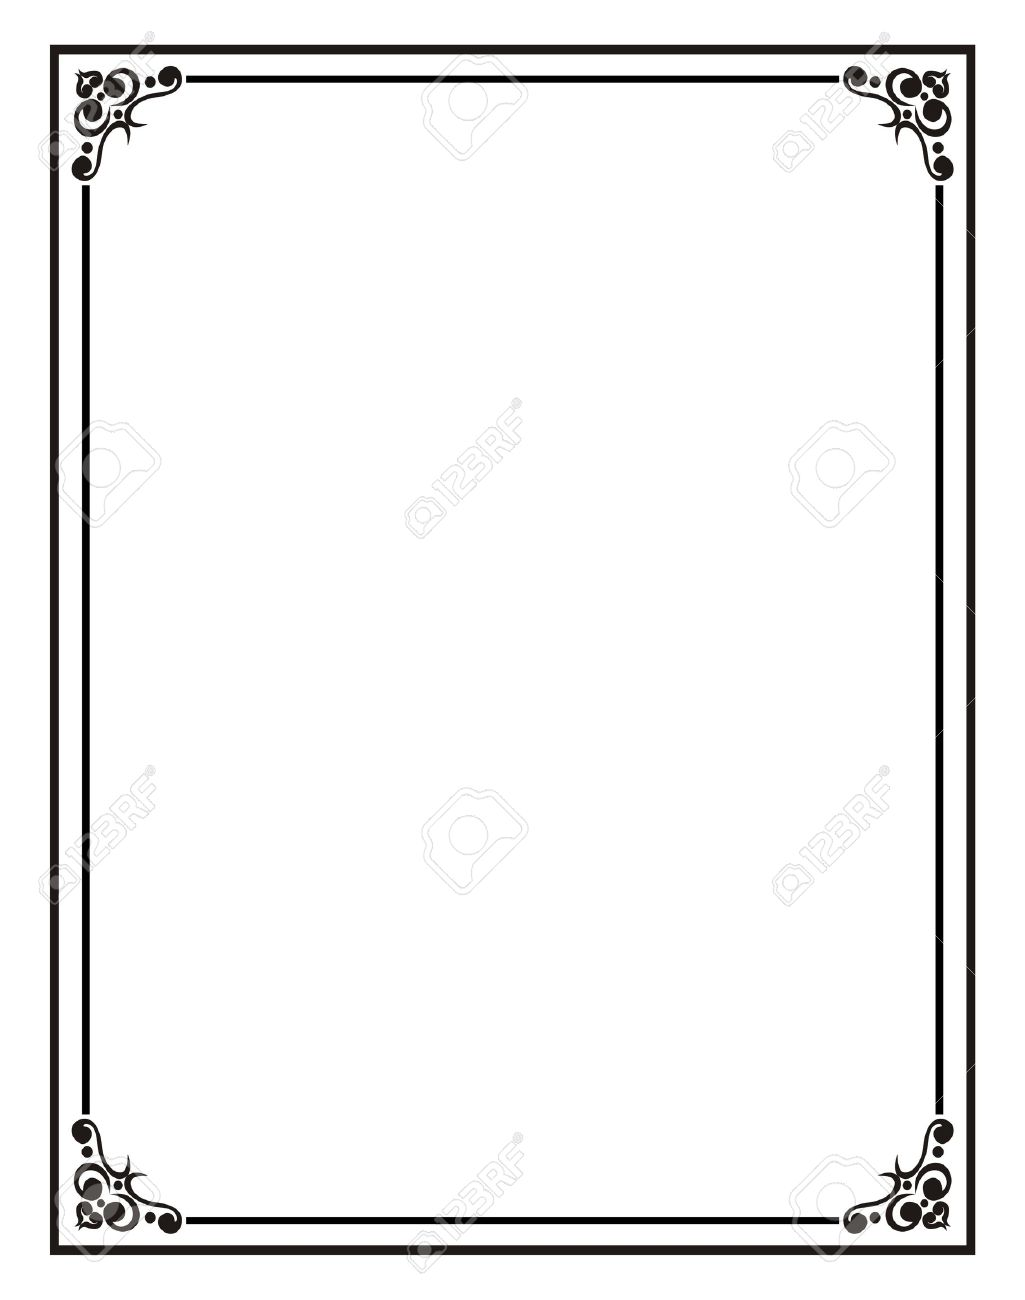 frame in microsoft word